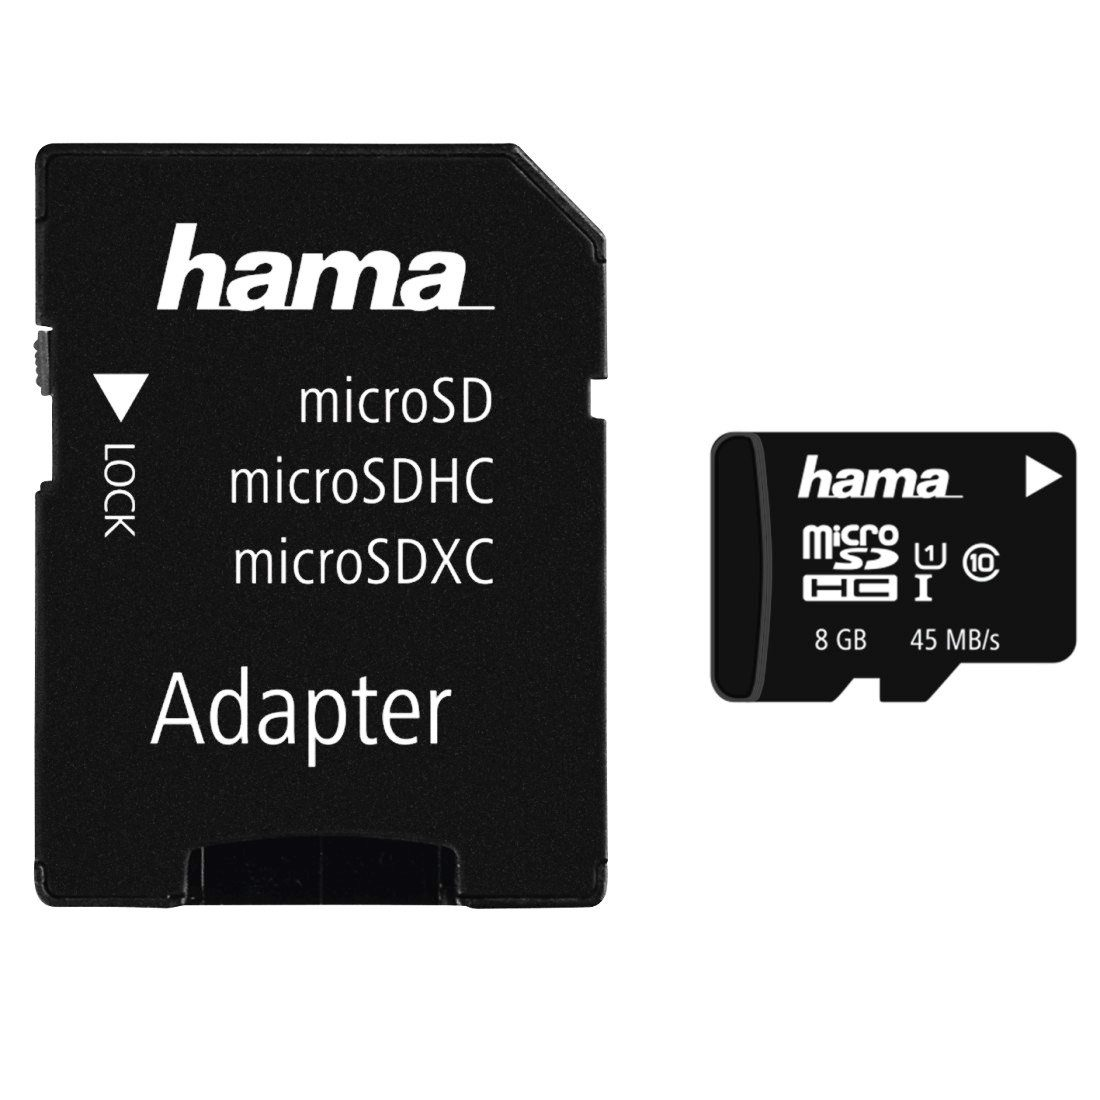 Hama Speicherkarte microSDHC, 8GB, Class 10 UHS-I »inkl. SD-Karten Adapter«